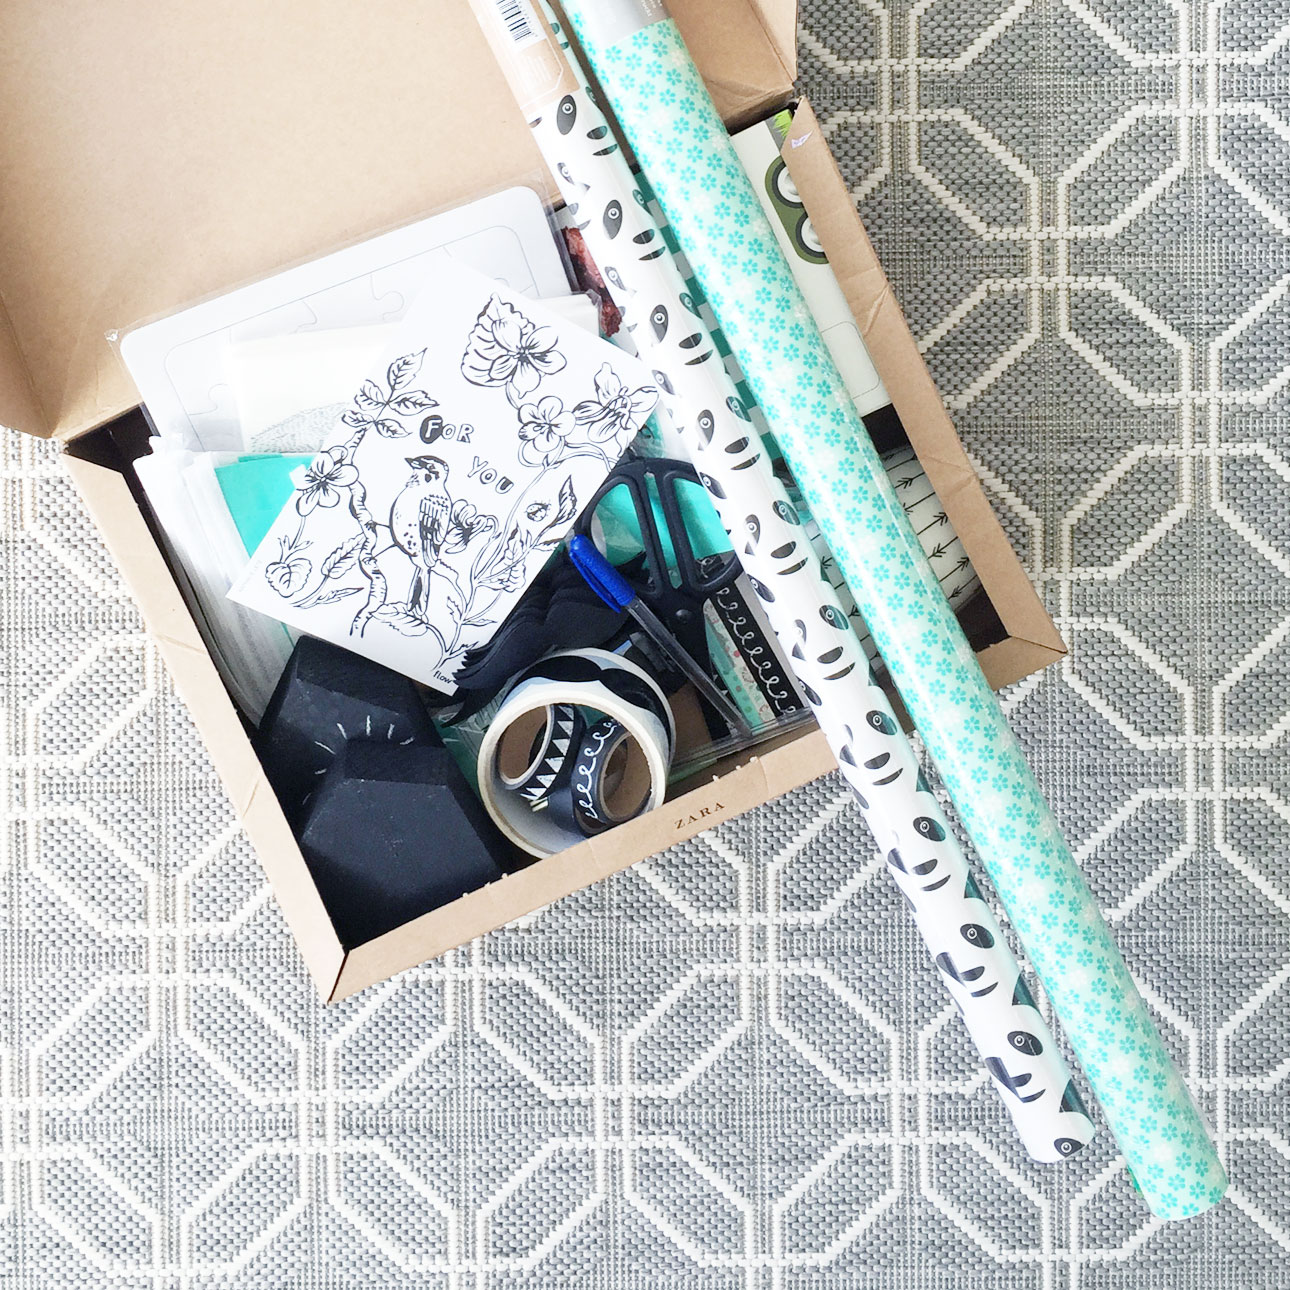 styleswapnl pakket doos cadeautjes